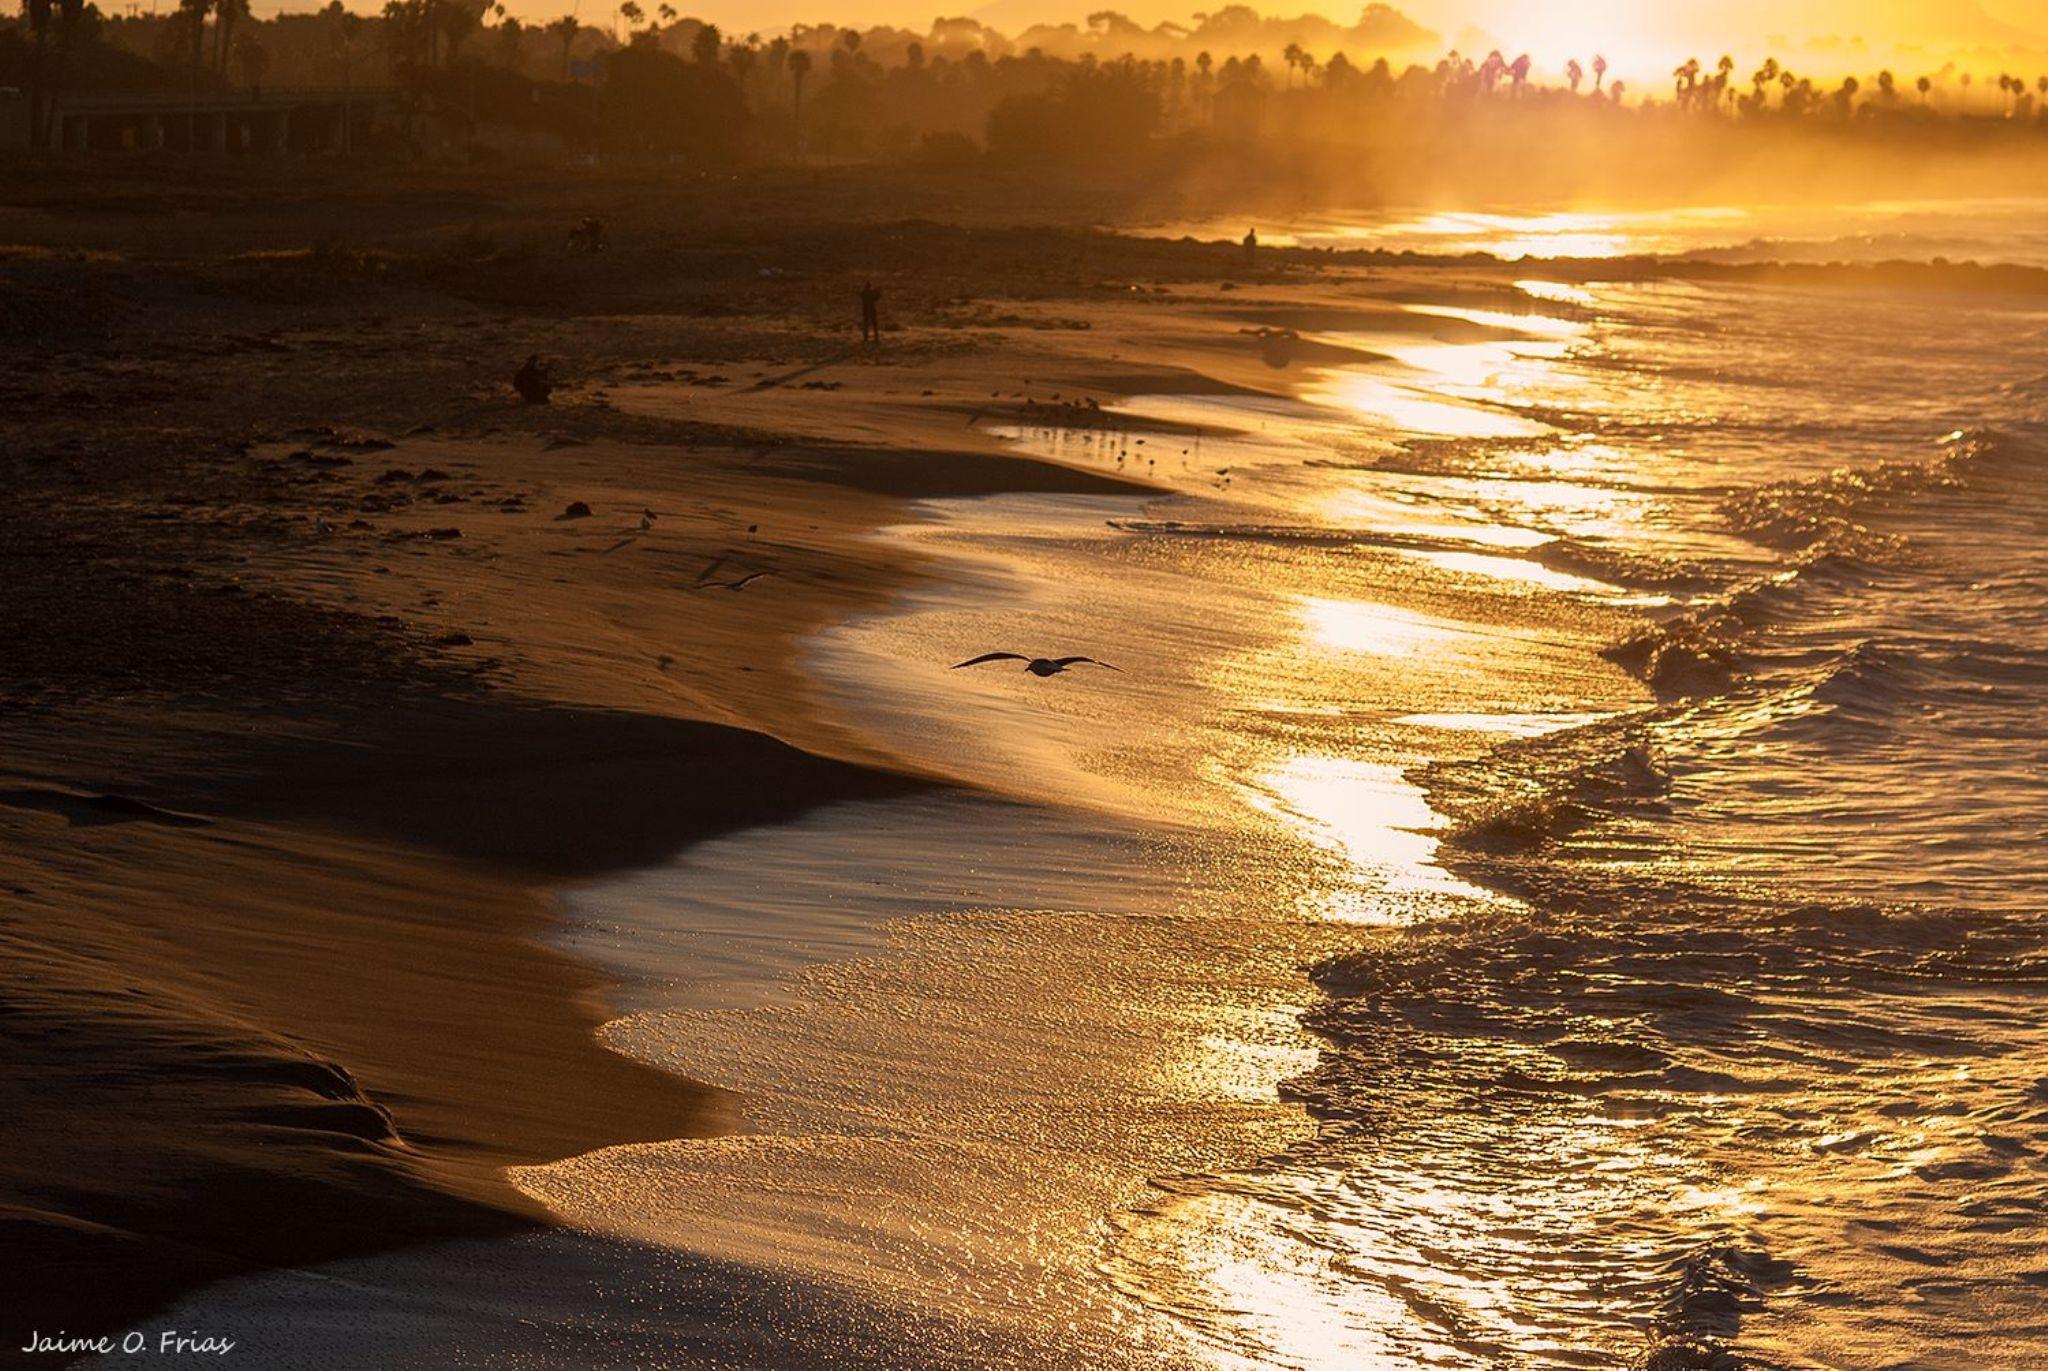 ocean by Jaime O. Frias